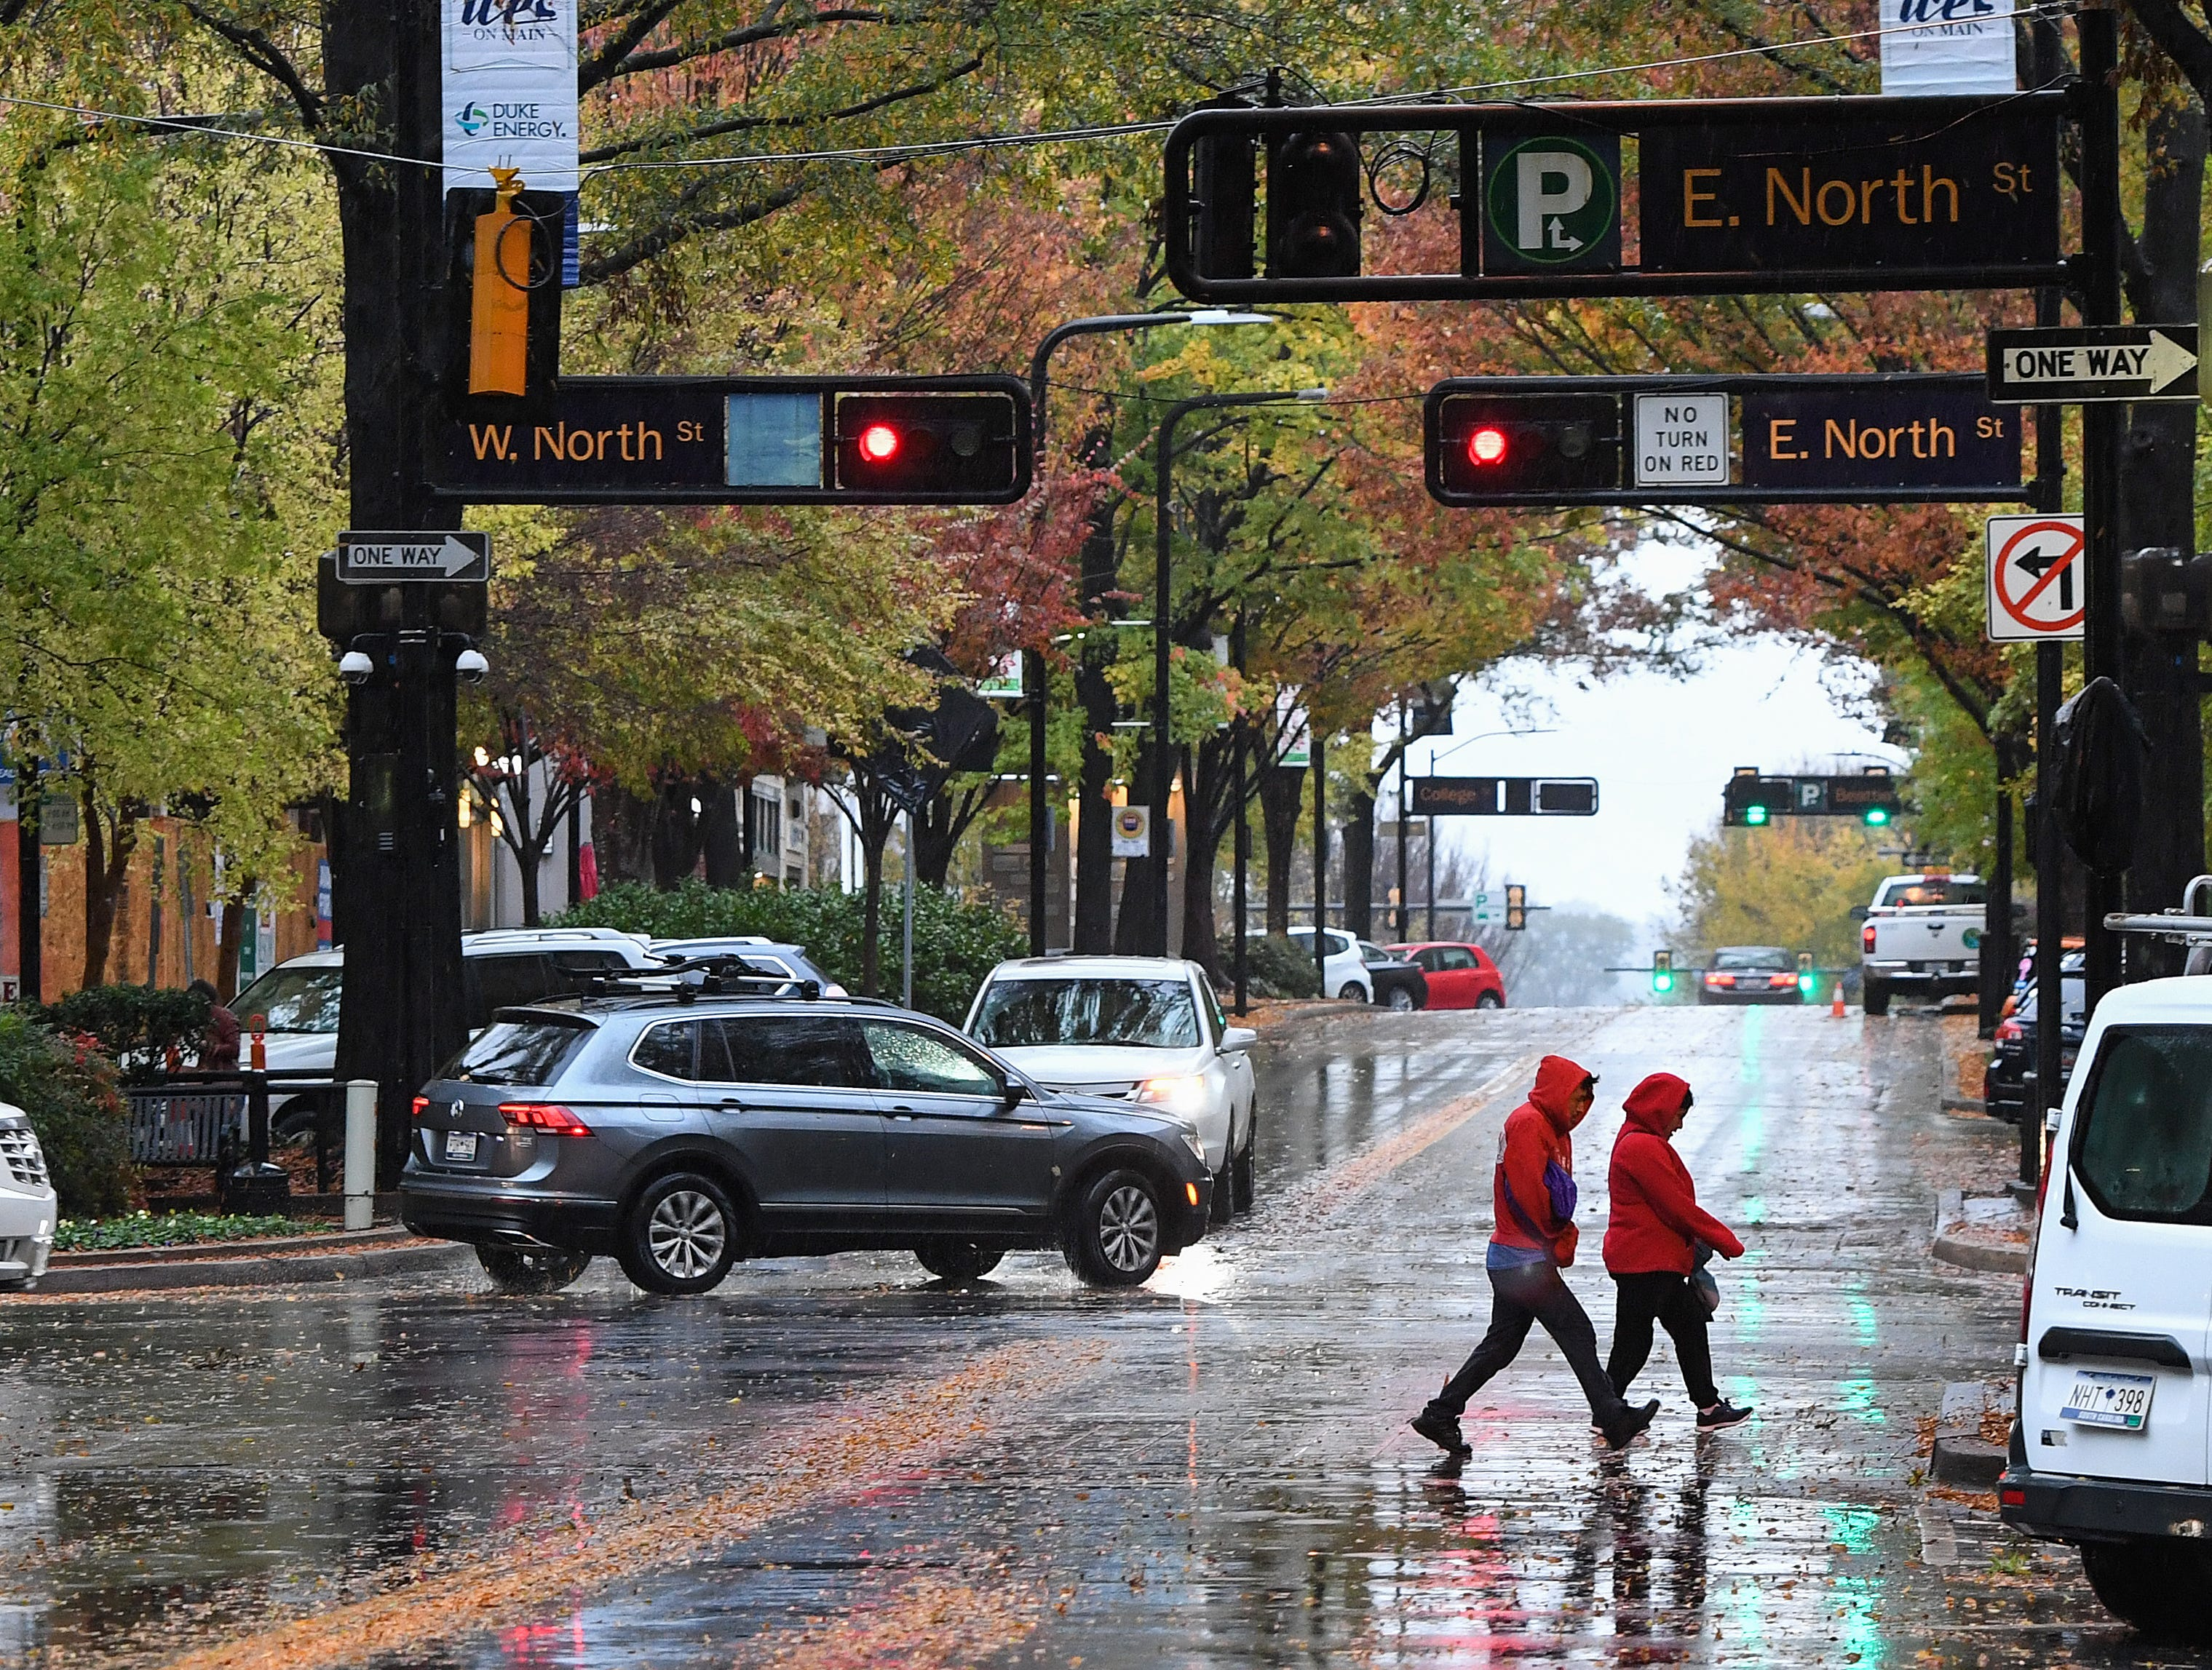 Rain falls on Main St. in downtown Greenville early Thursday, November 15, 2018.